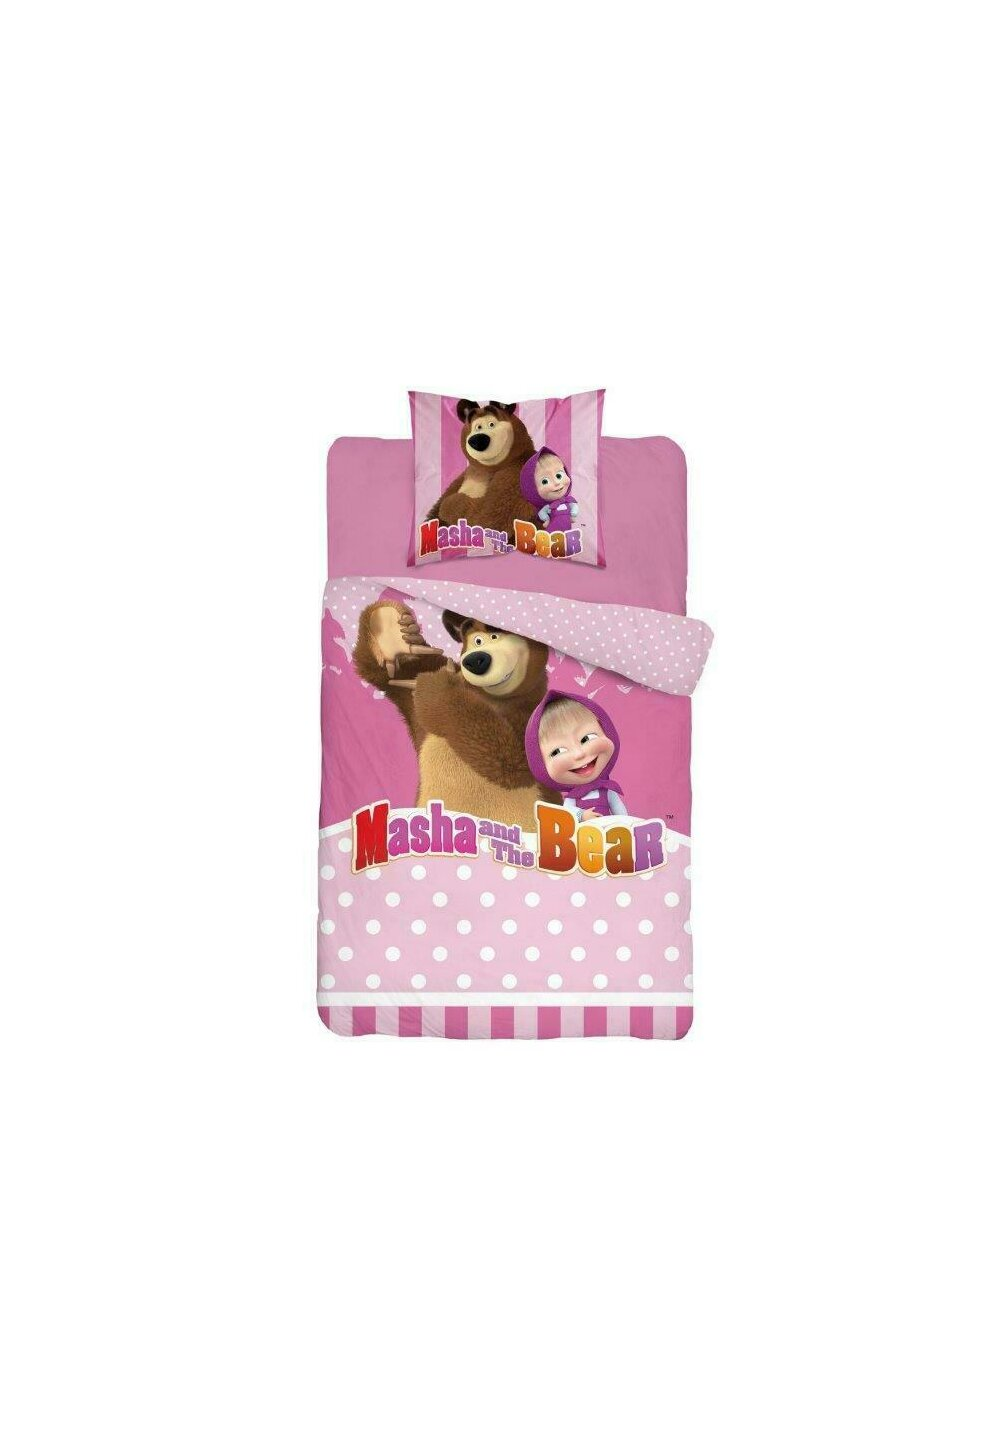 Lenjerie pat, Masha si Ursul, roz cu buline albe,160x200 cm imagine